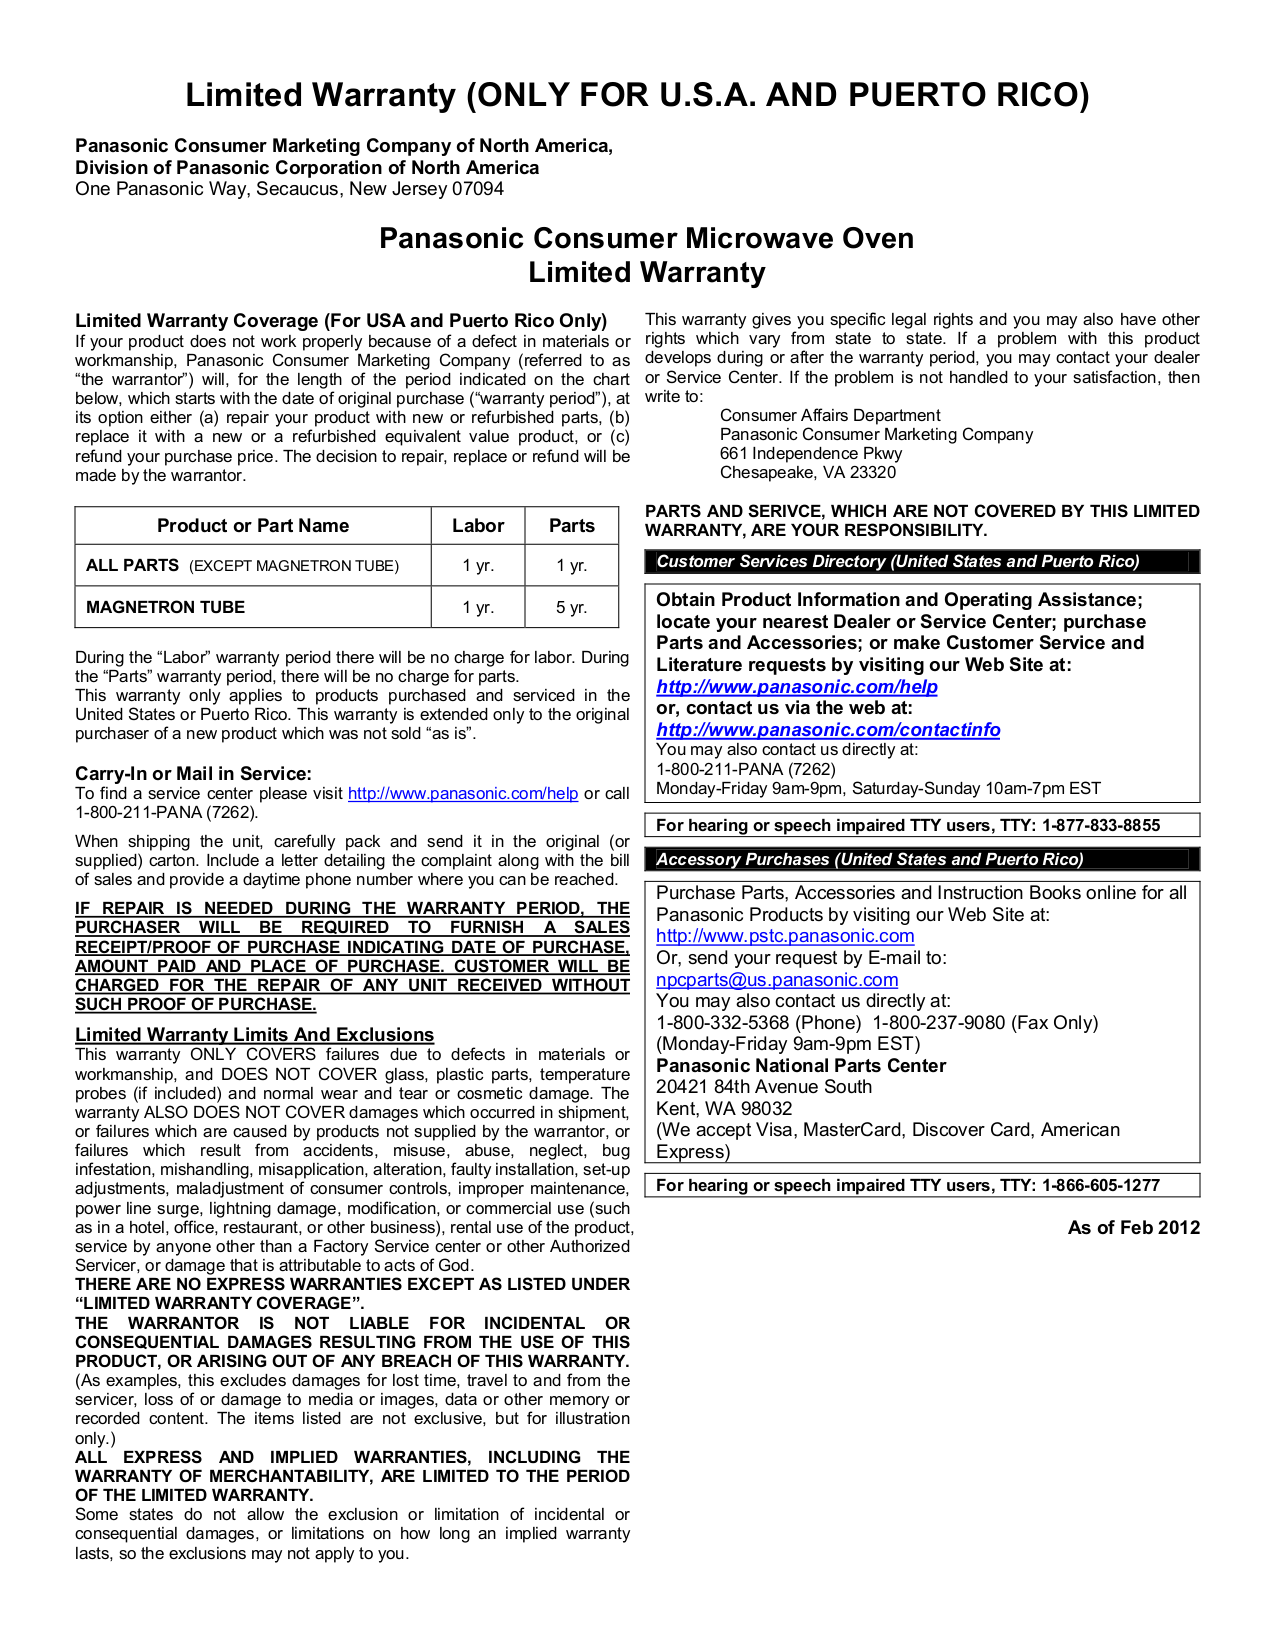 panasonic inverter microwave instruction manual